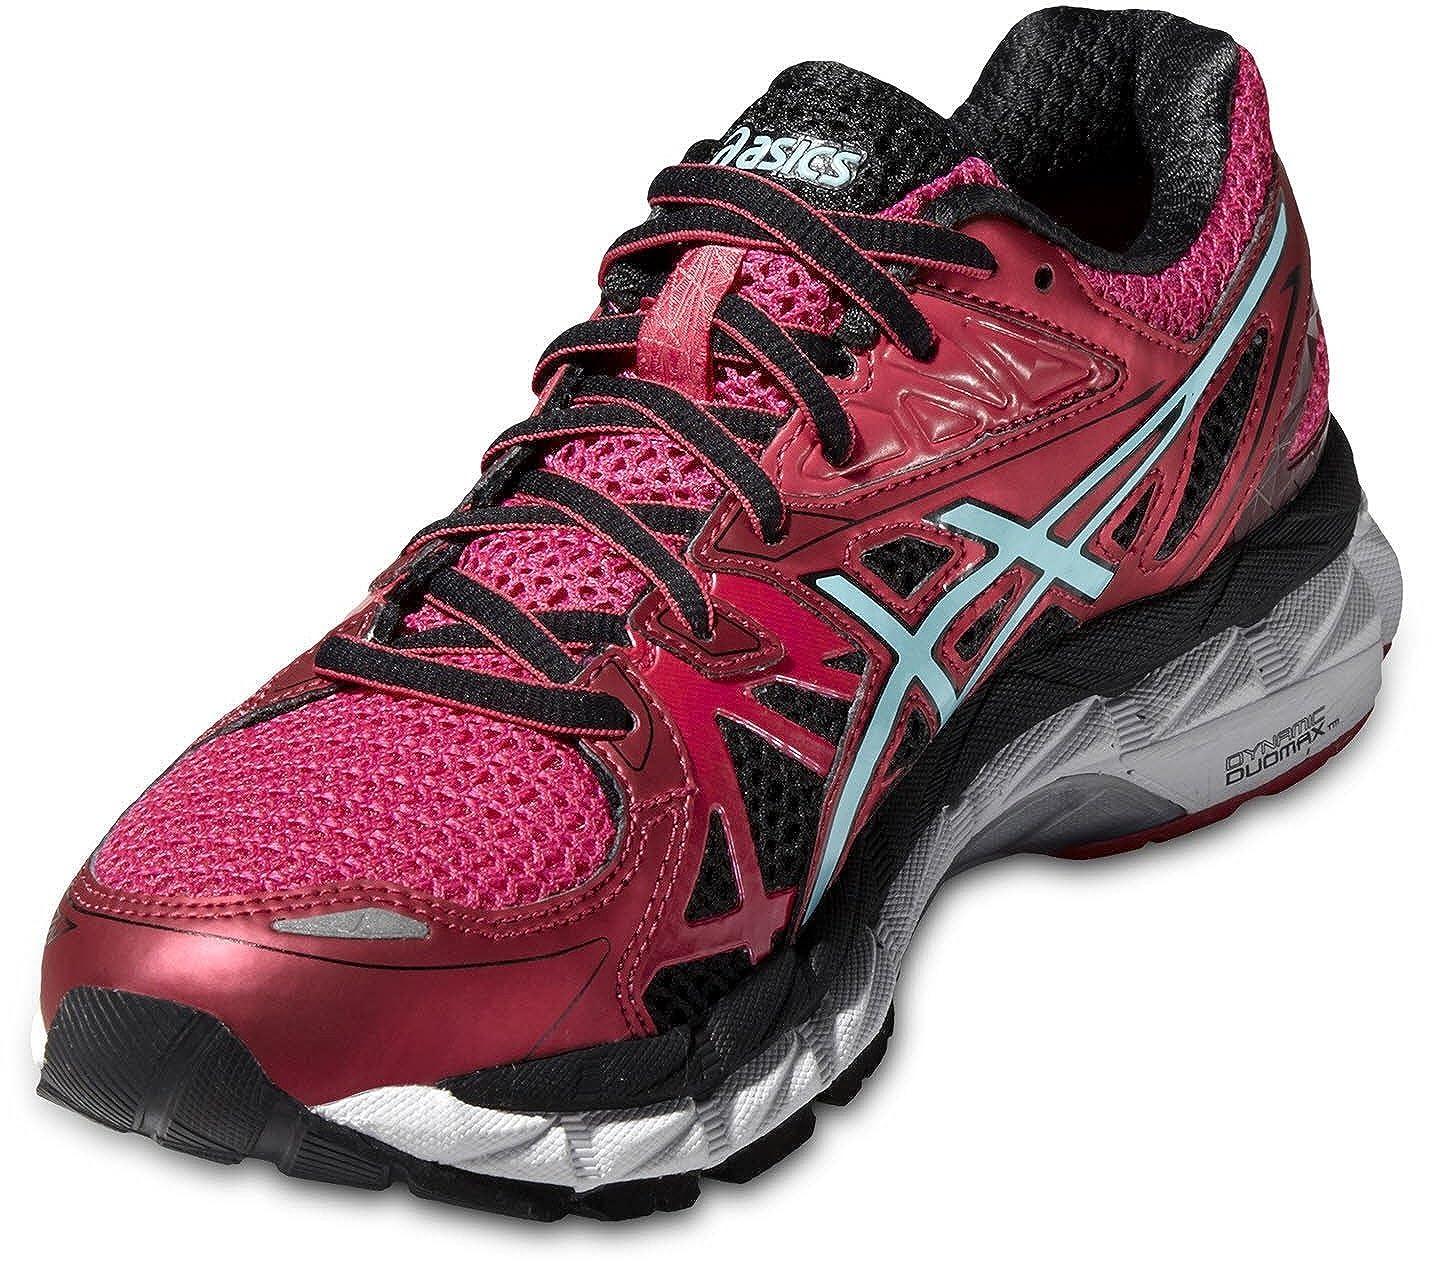 ASICS - Gel-luminus, scarpe scarpe scarpe da ginnastica Donna c7fe52